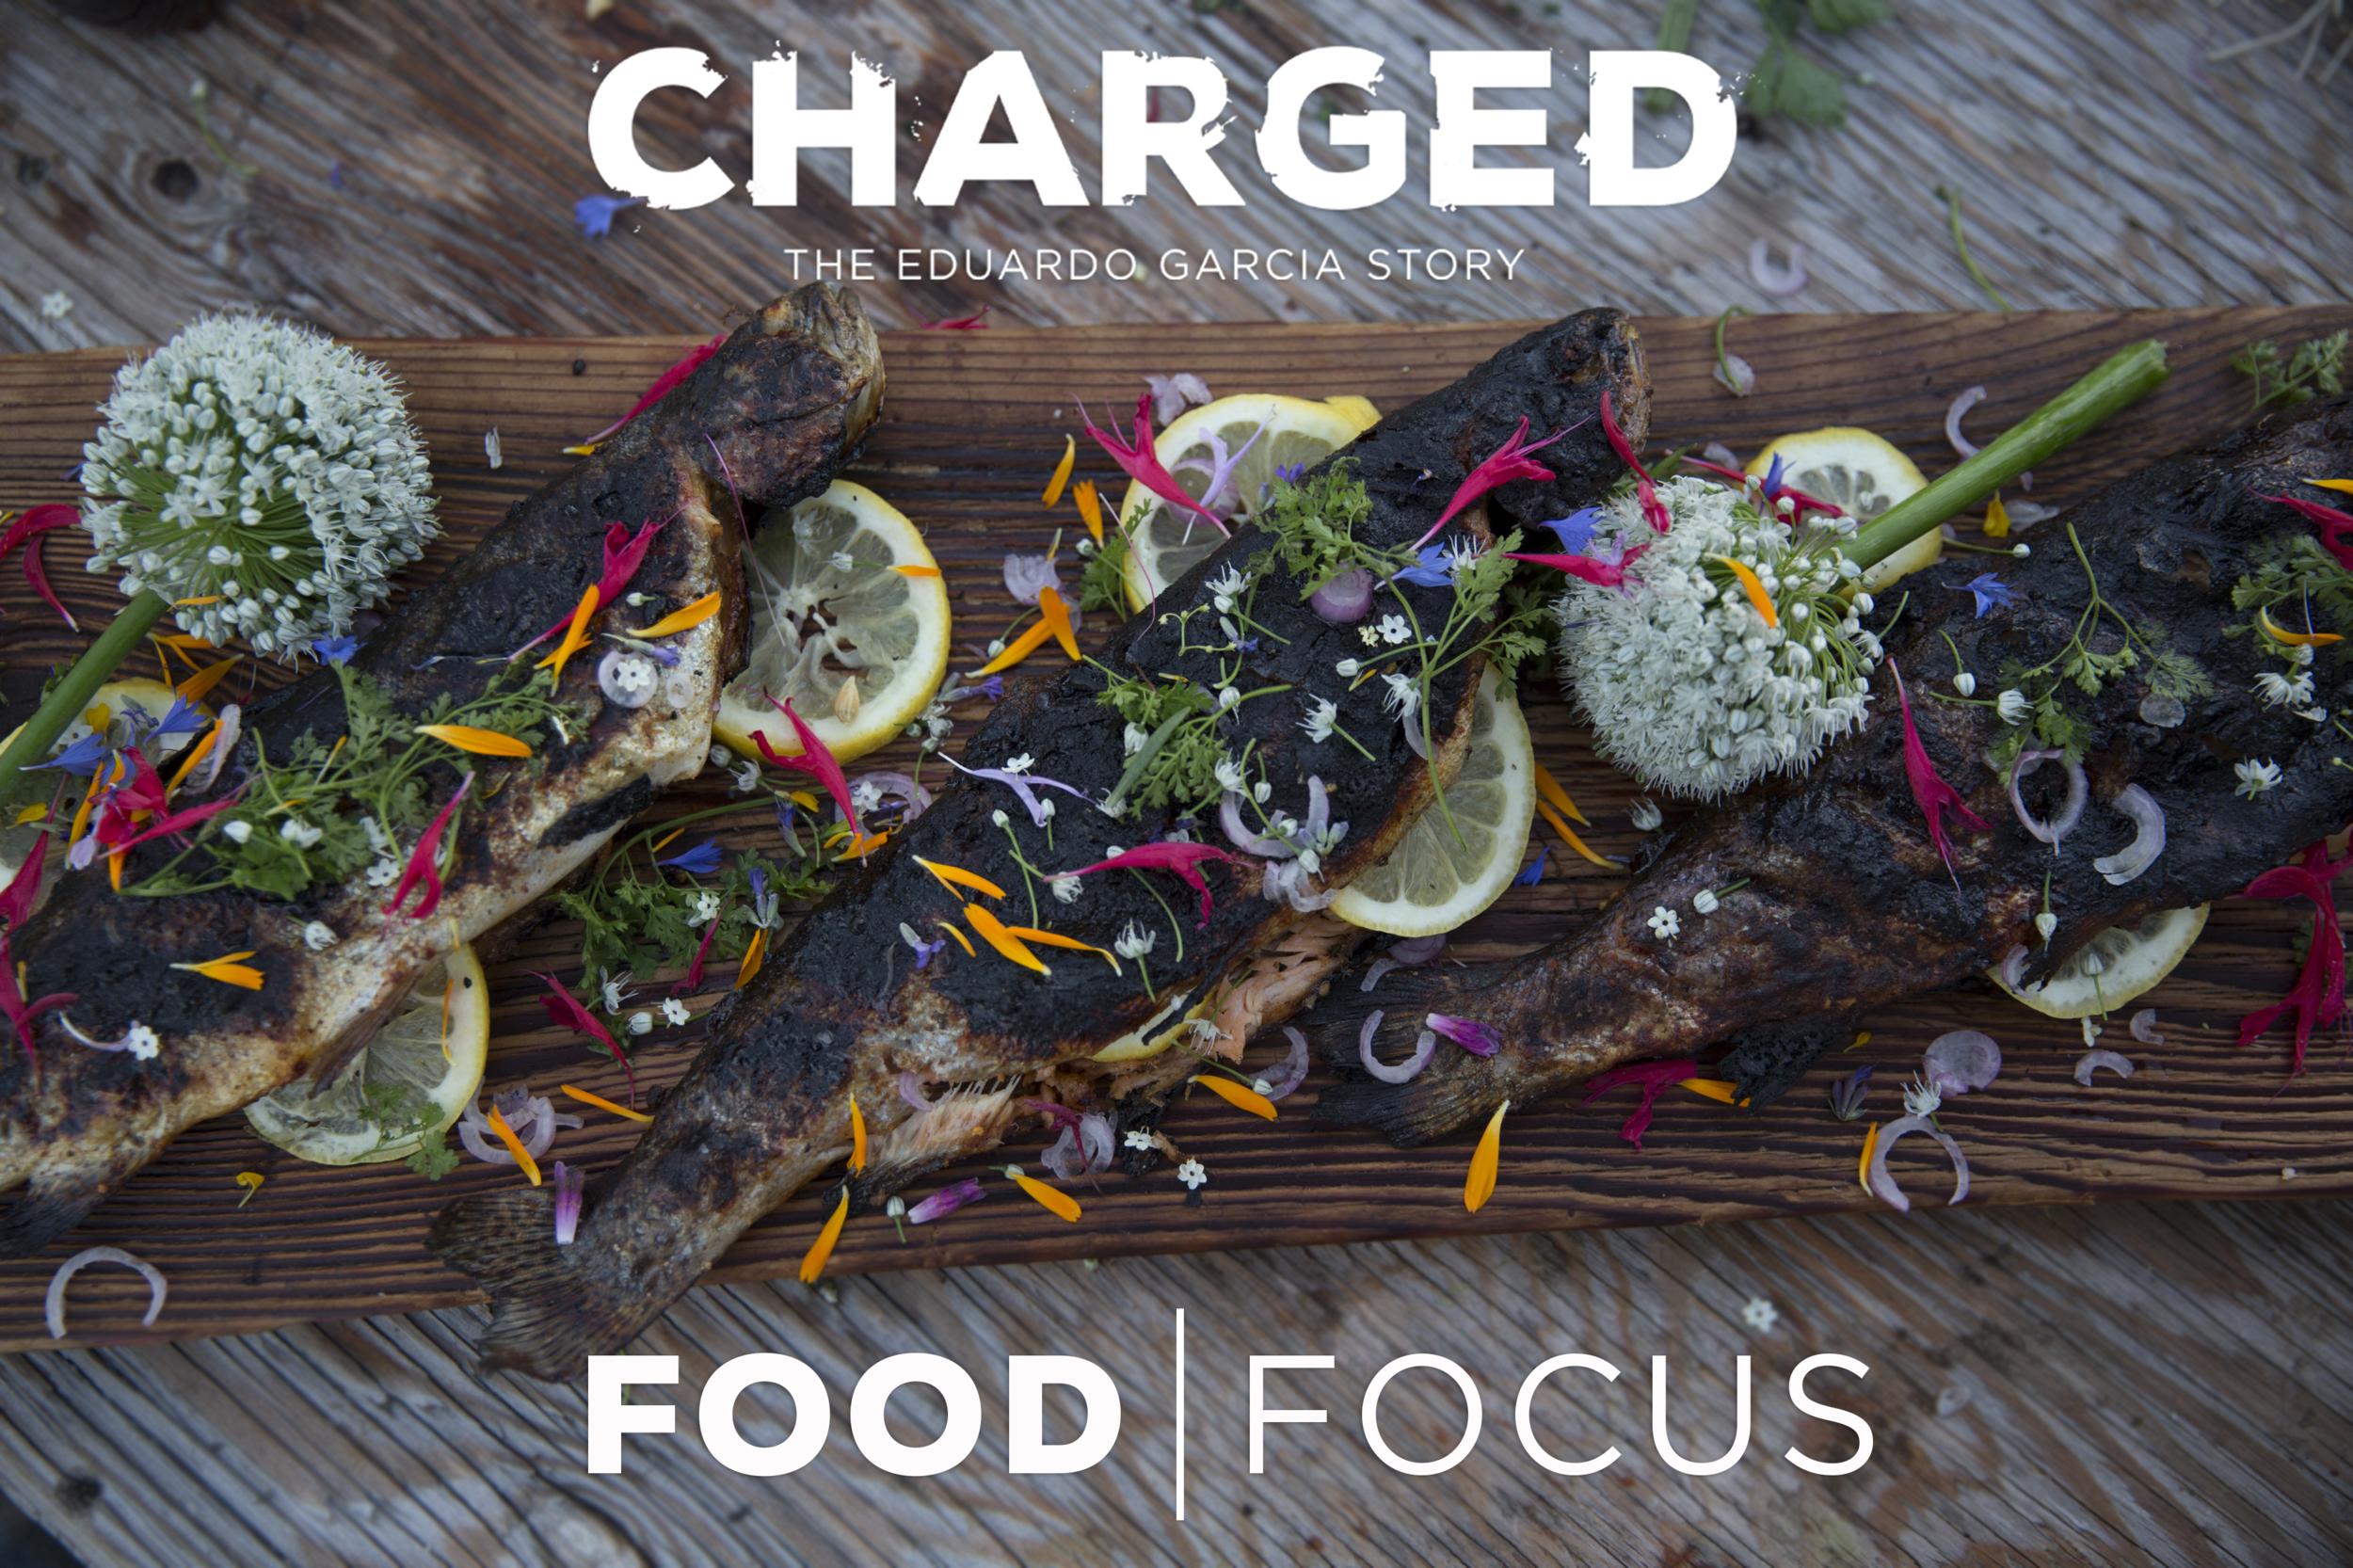 Charged_Food Focus_Eduardo Garcia